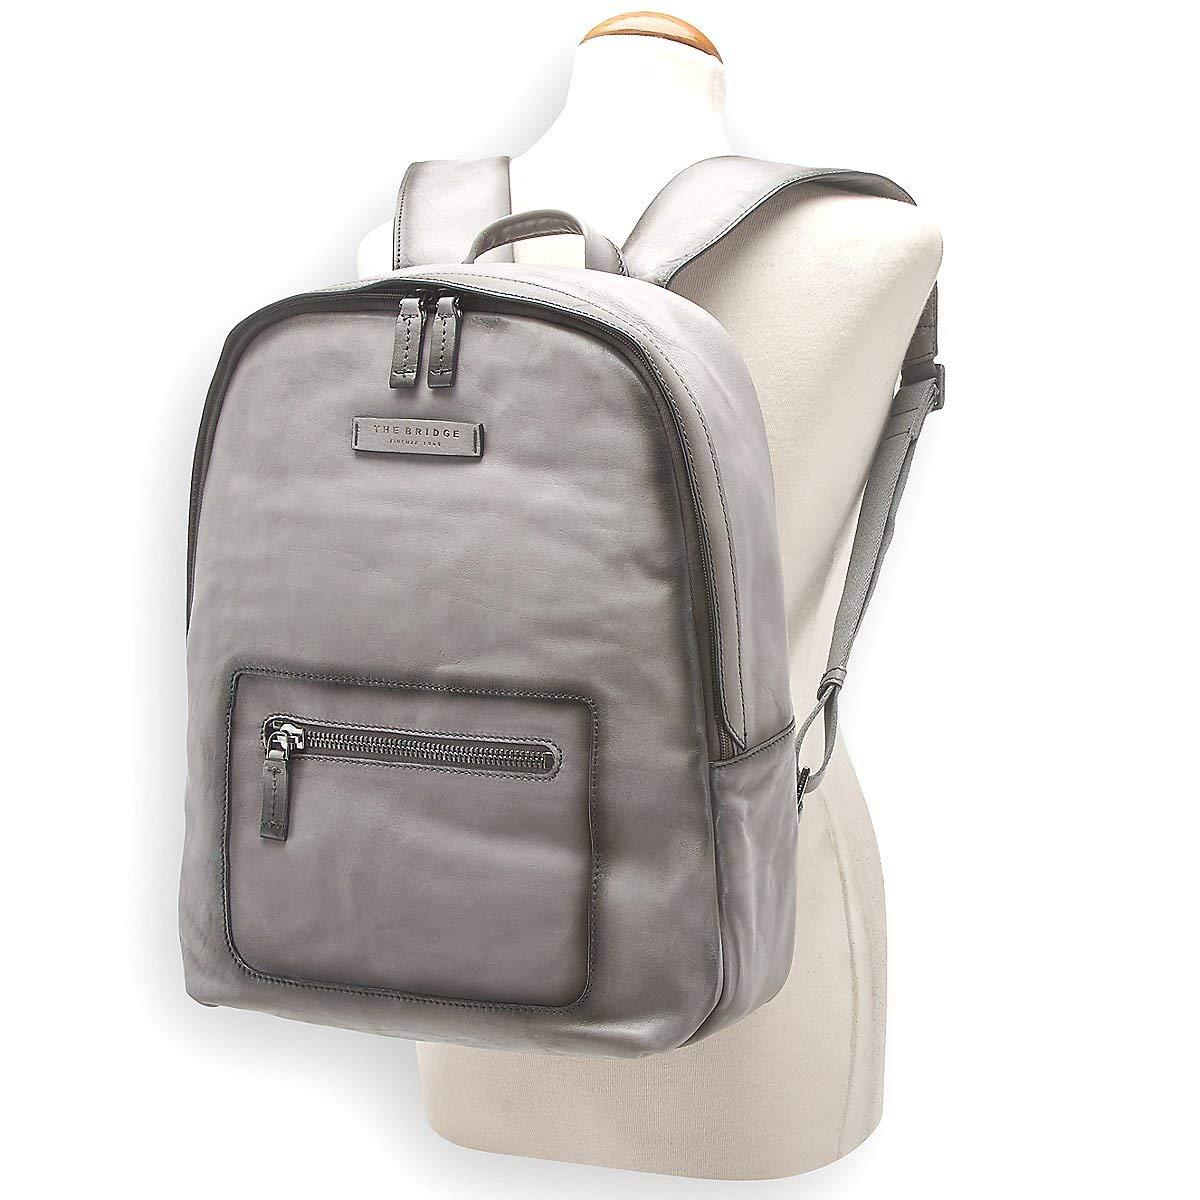 02b01d58f2 Zaino Porta Pc | The Bridge Pelle Freestyle | 0647273V-Nero/Canna di  Fucile: Amazon.co.uk: Luggage